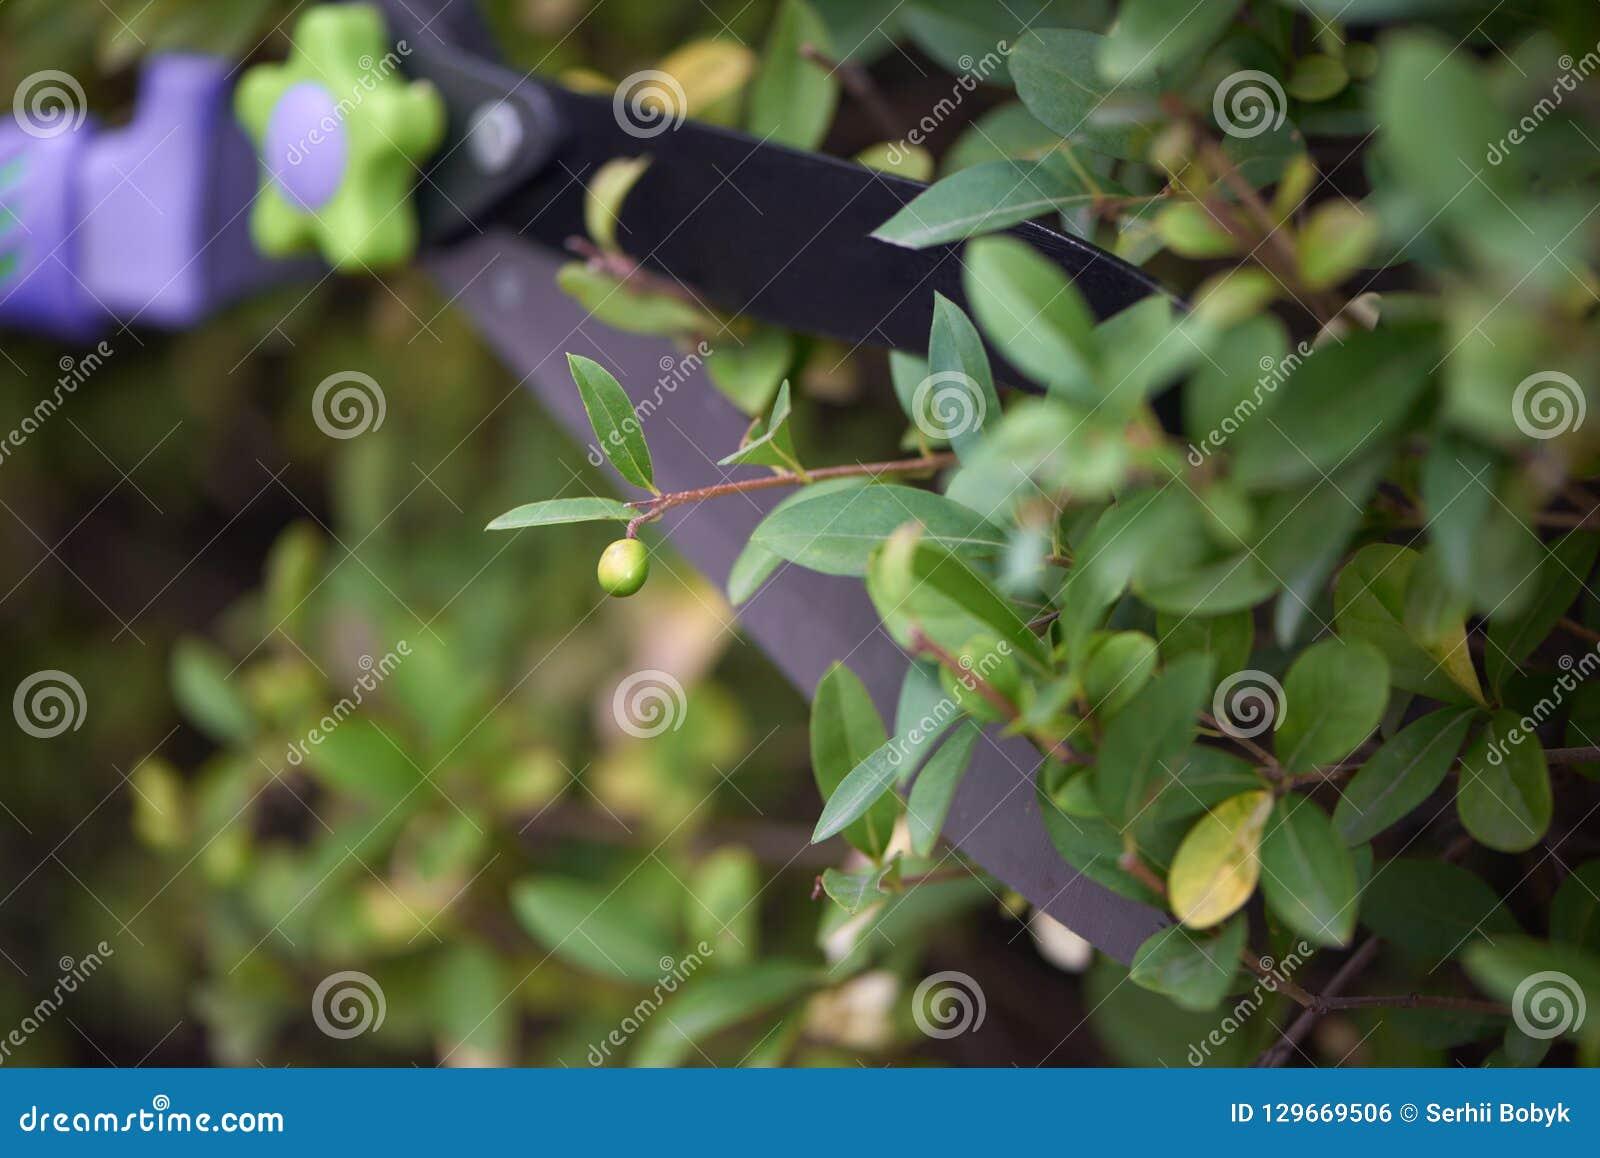 Lâmina das tesouras do jardim que eliminam a baga pequena